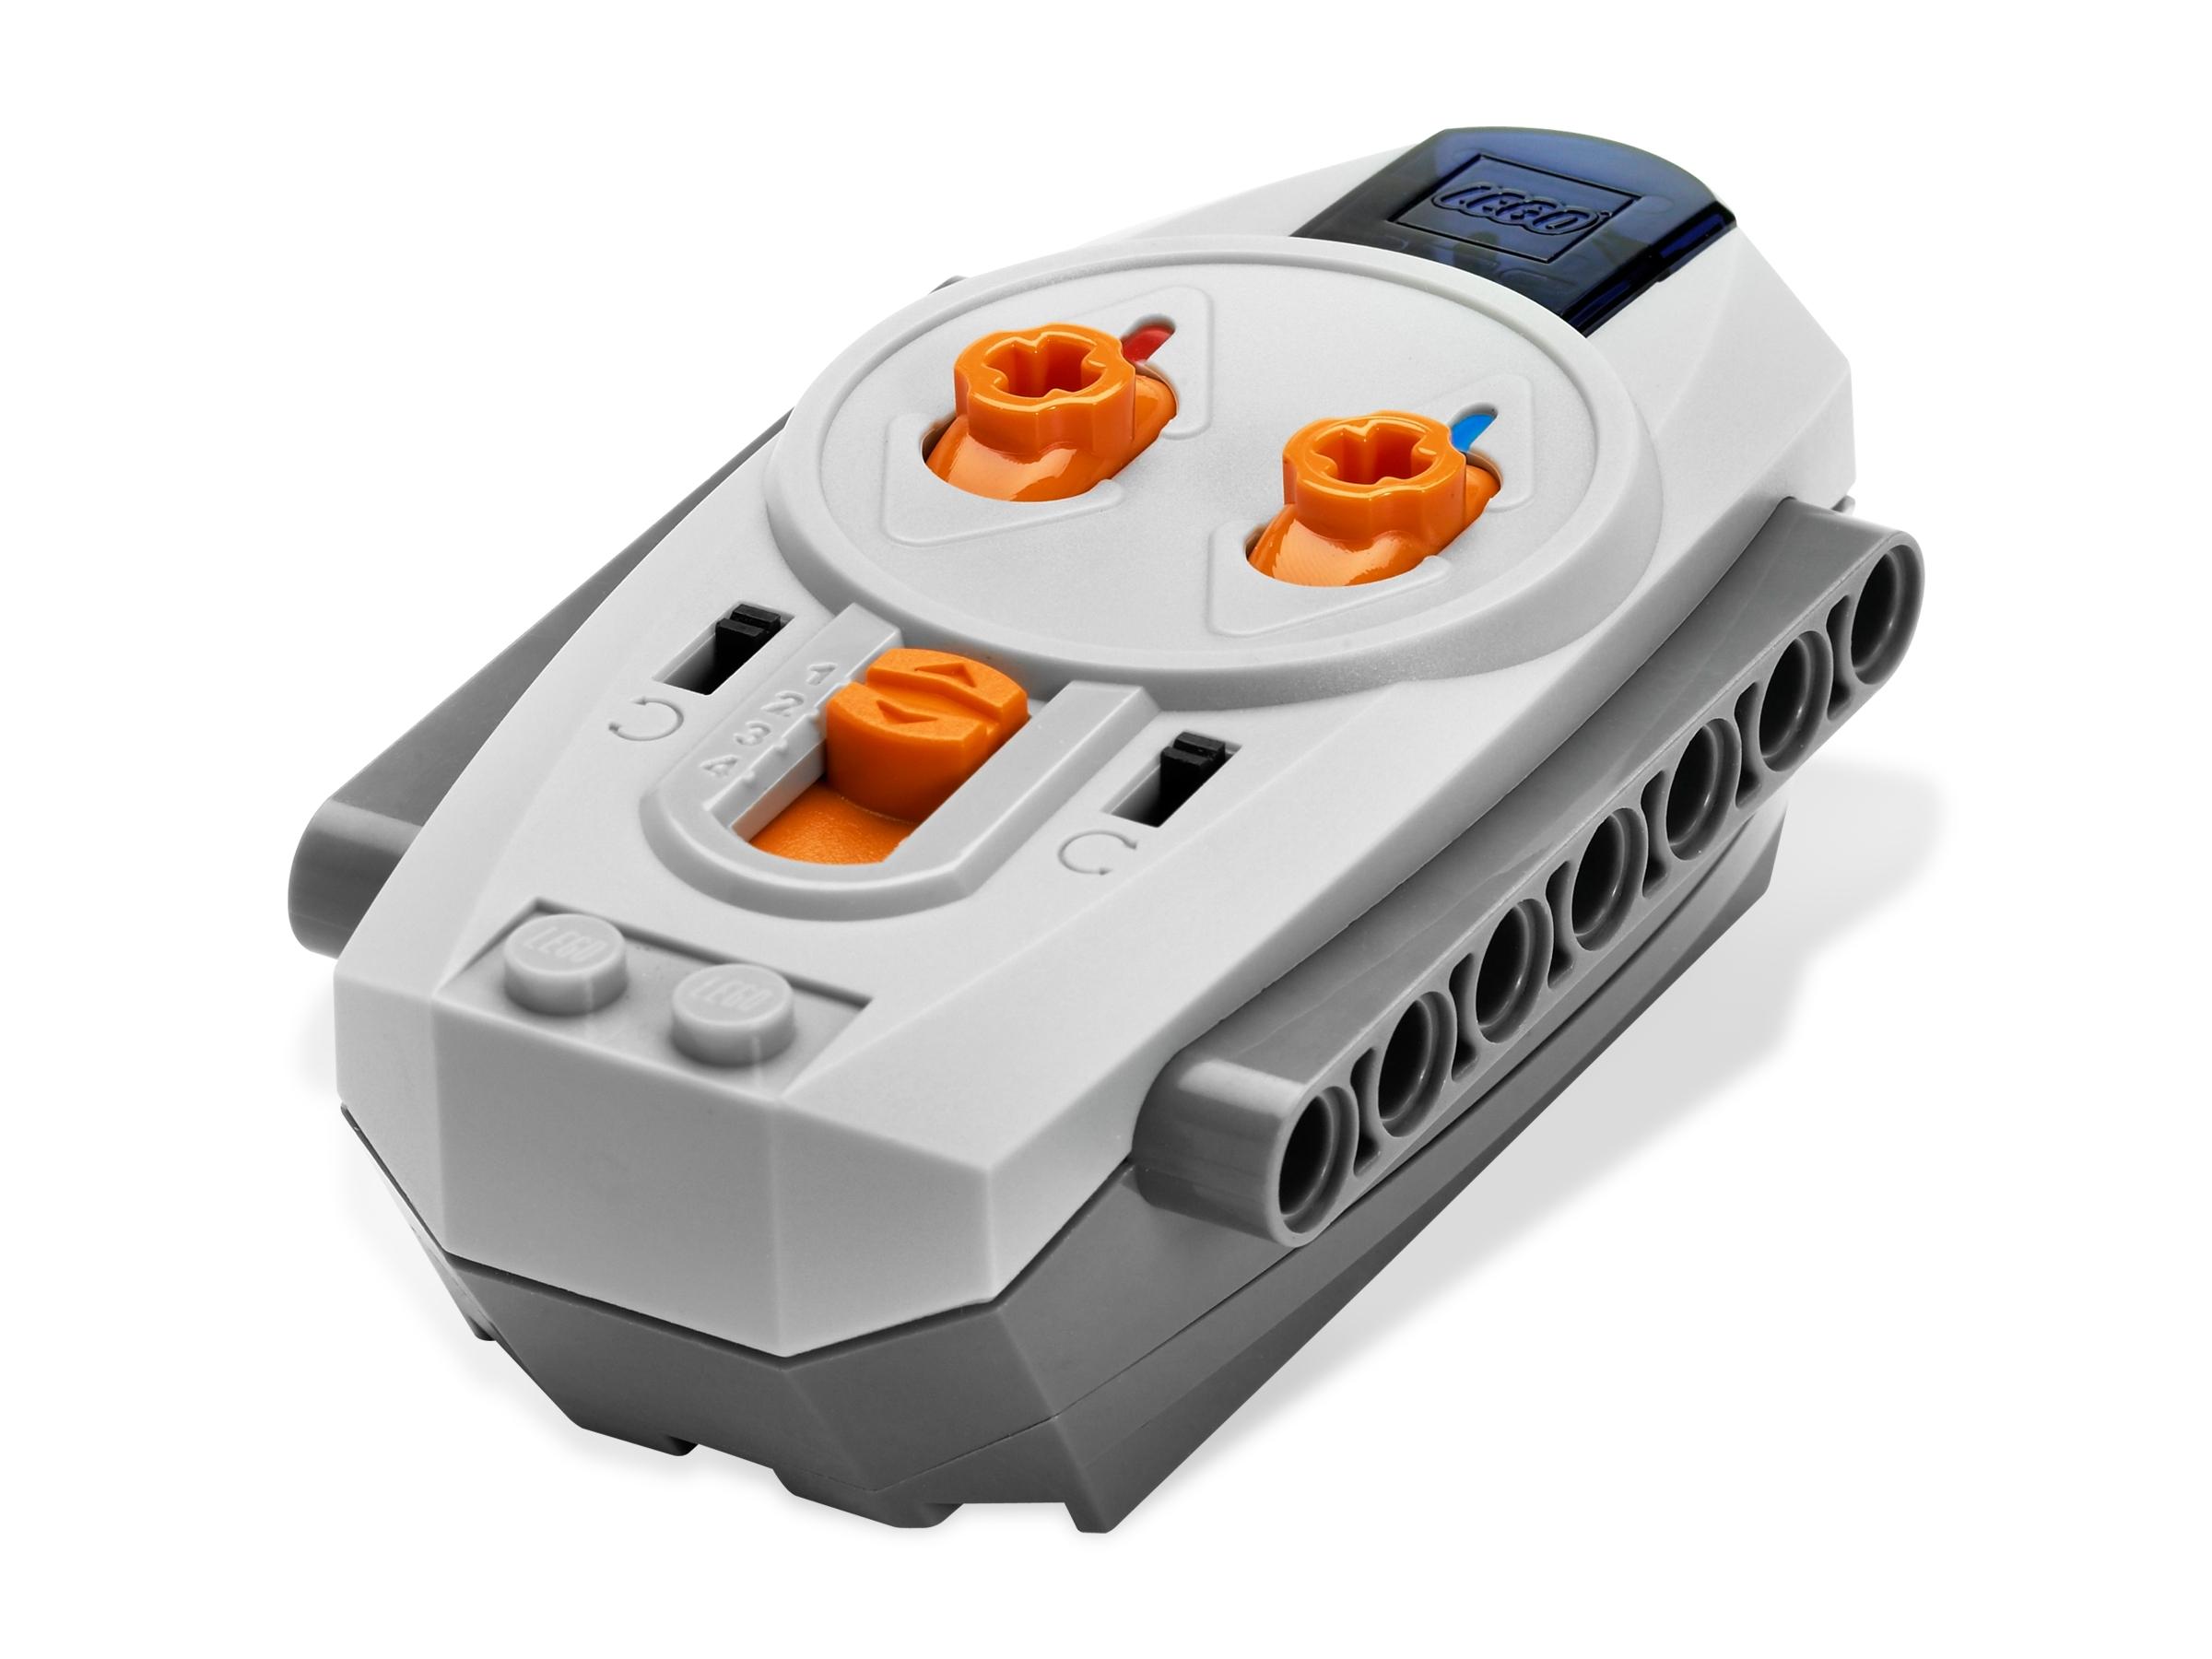 lego powerfuncties ir tx 8885